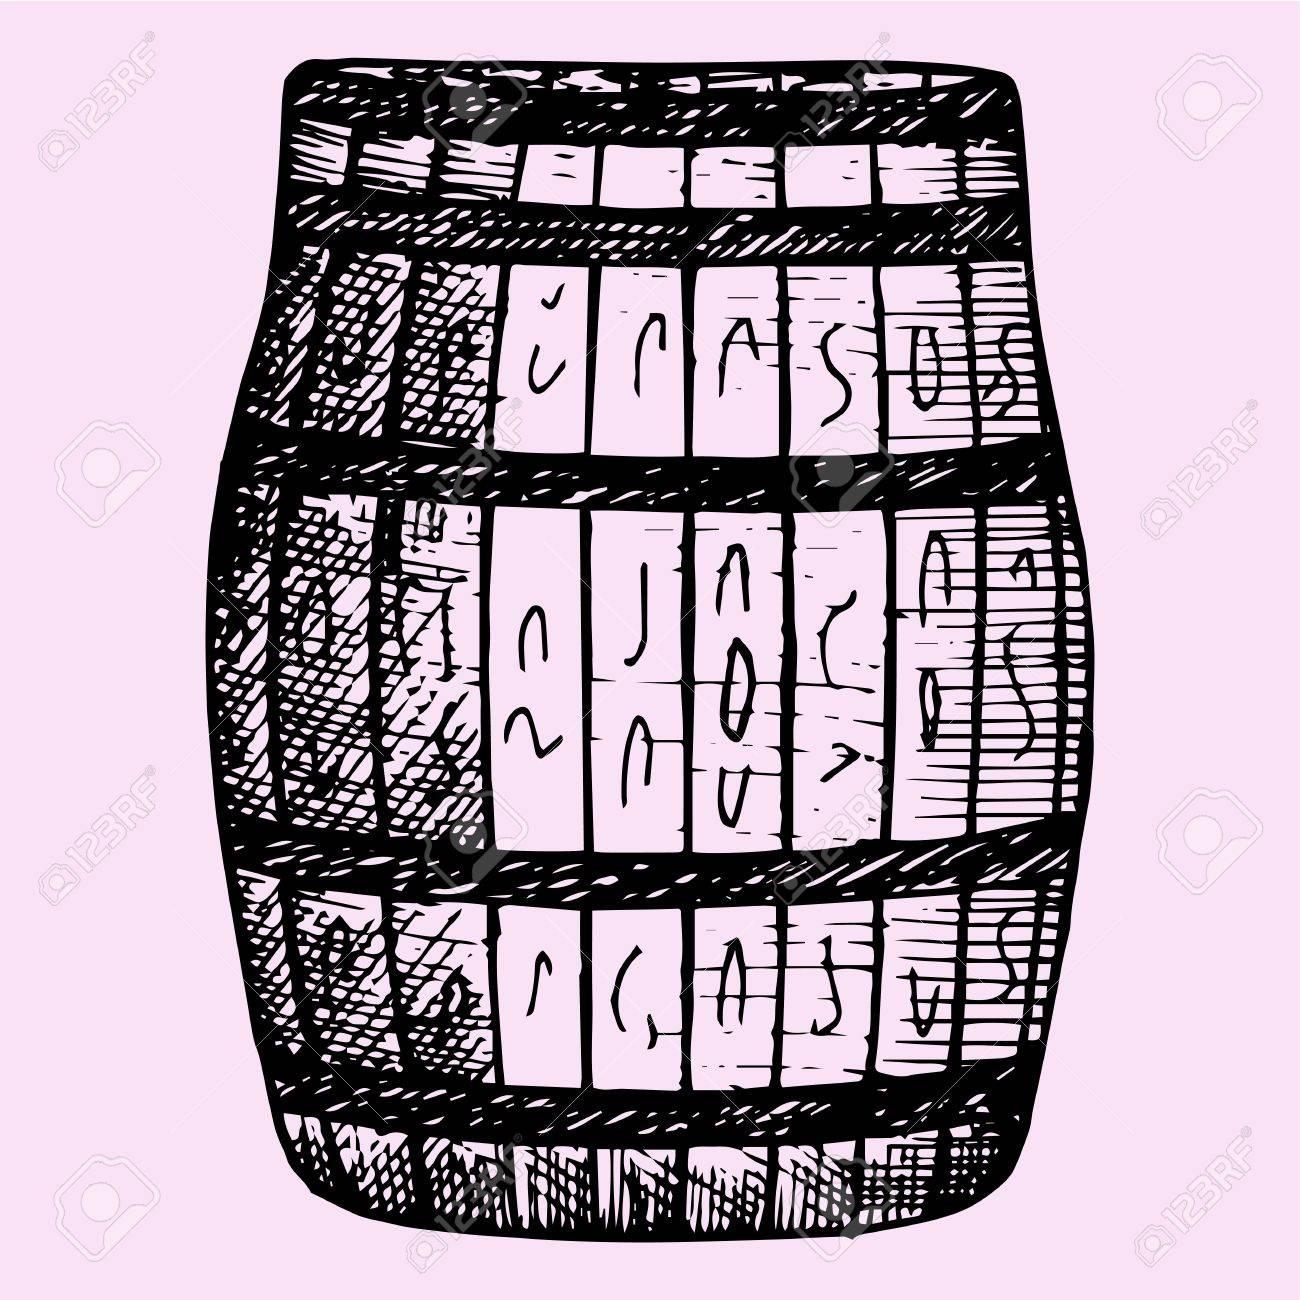 1300x1300 Old Wooden Barrel, Hand Drawn, Doodle Style, Sketch Illustration